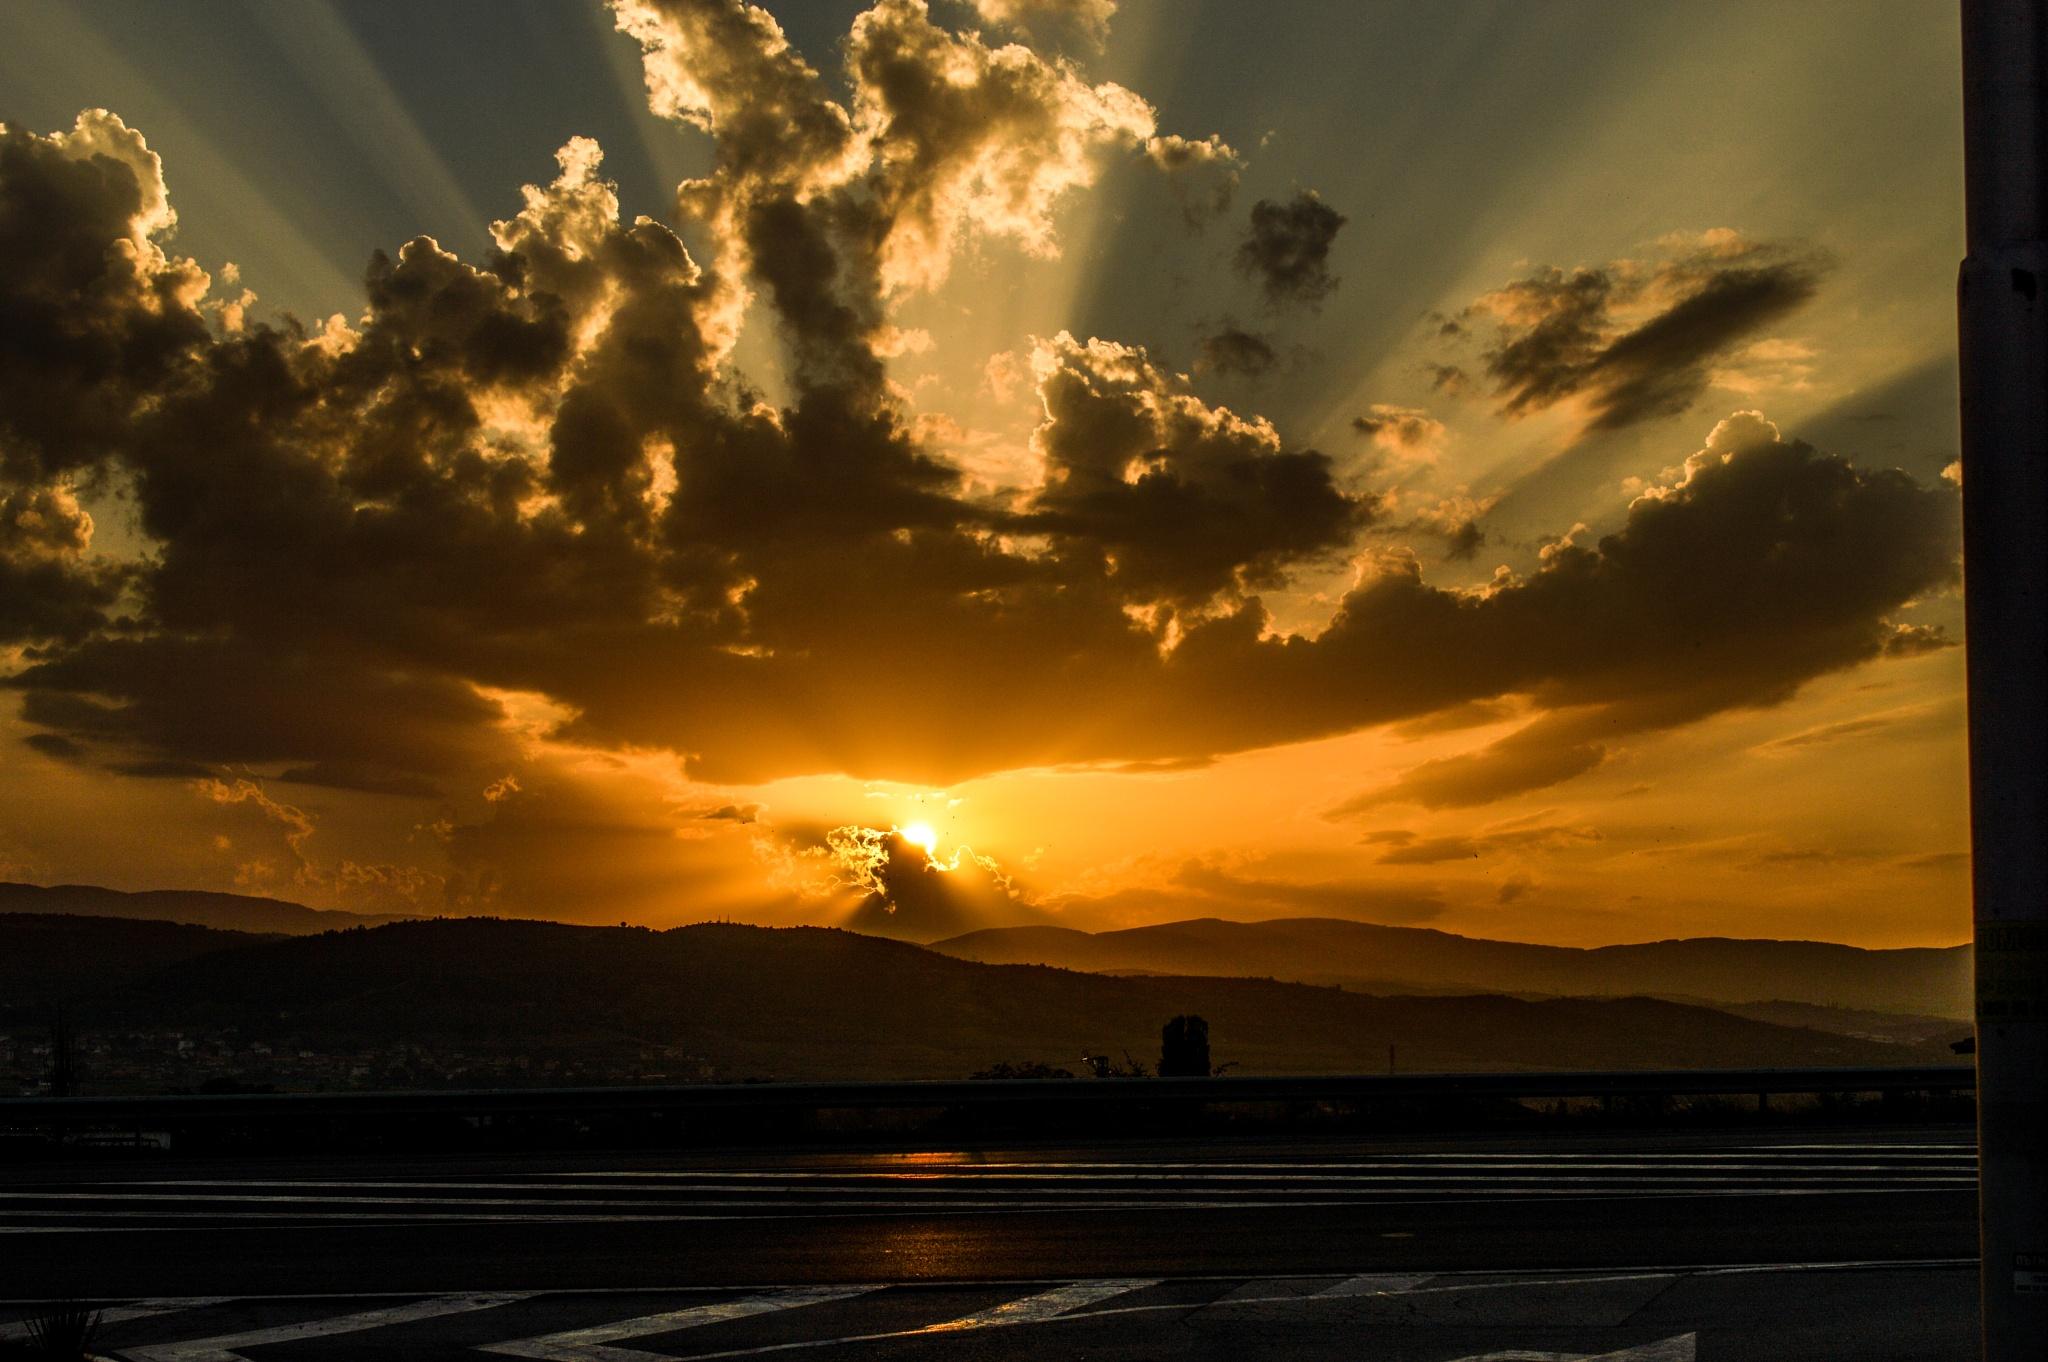 sunset by Rotaru Dan